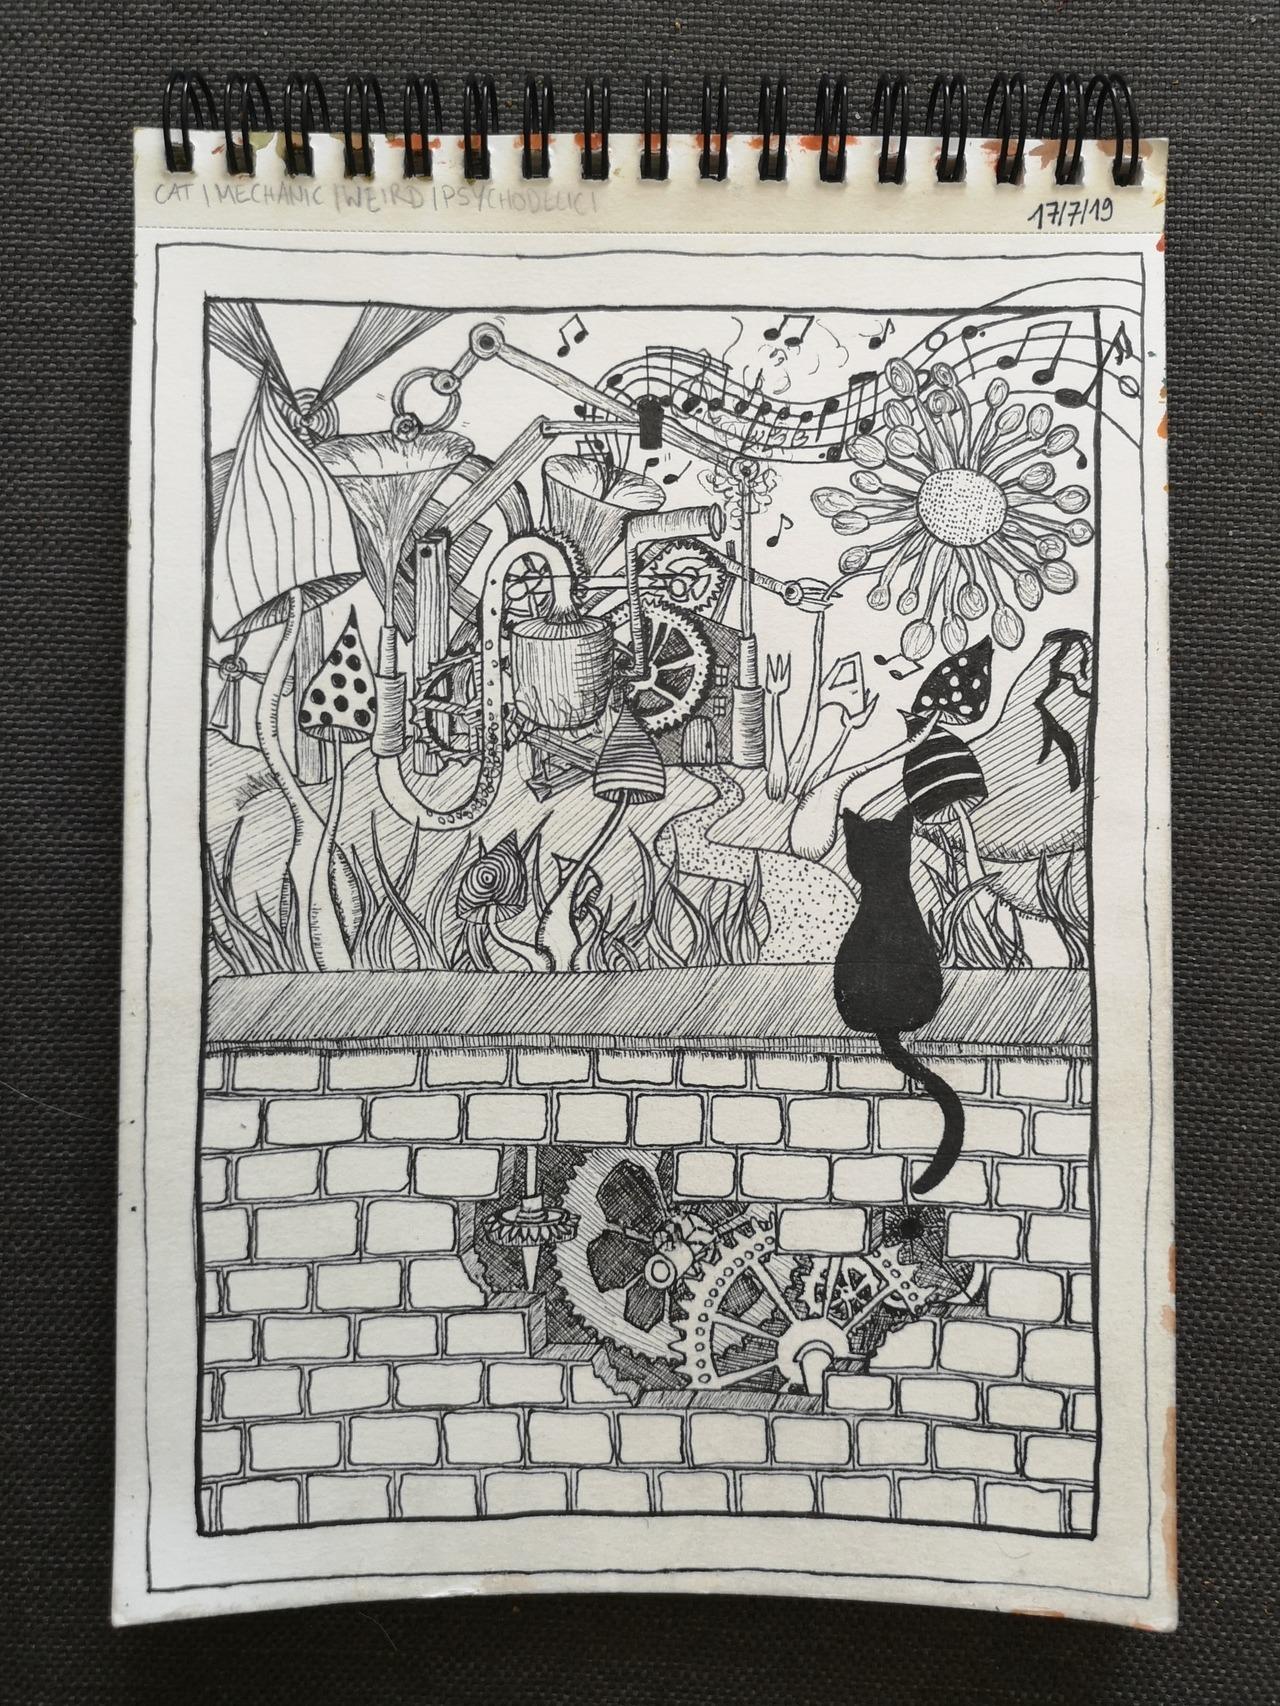 'Junkbox' #graphic#artontumblr#artoftumblr#fineliner#finelineart#finelinework#details#cat#catlover#flowerpower#gear#mechanic#psychodelic#mushrooms#trippy#weirdo#creative#lolaleilani